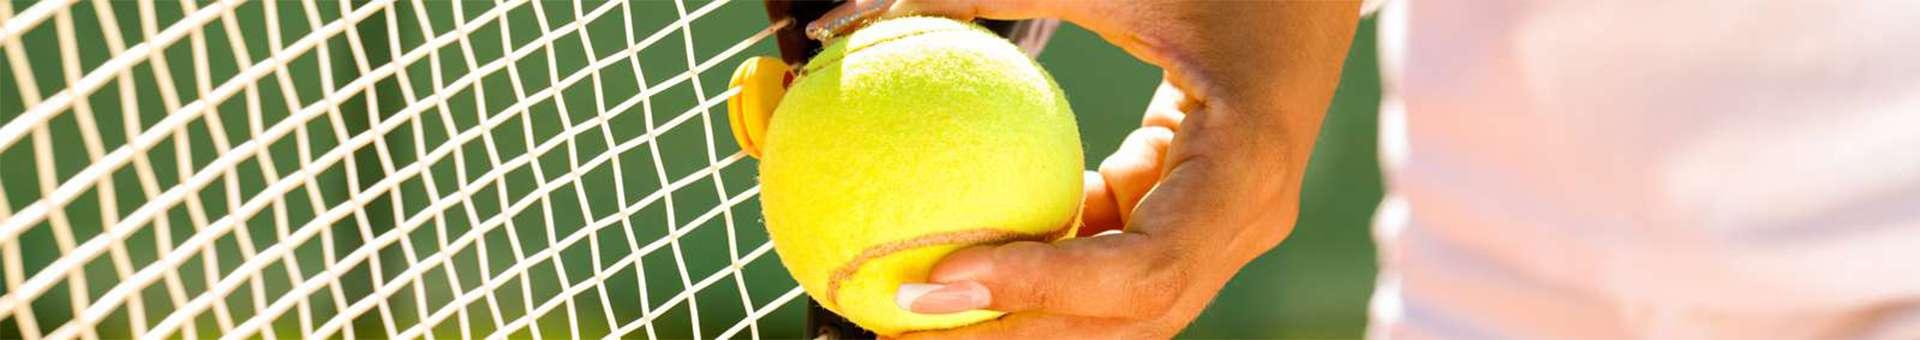 Búsqueda de información Whois de nombres de dominios  .tennis